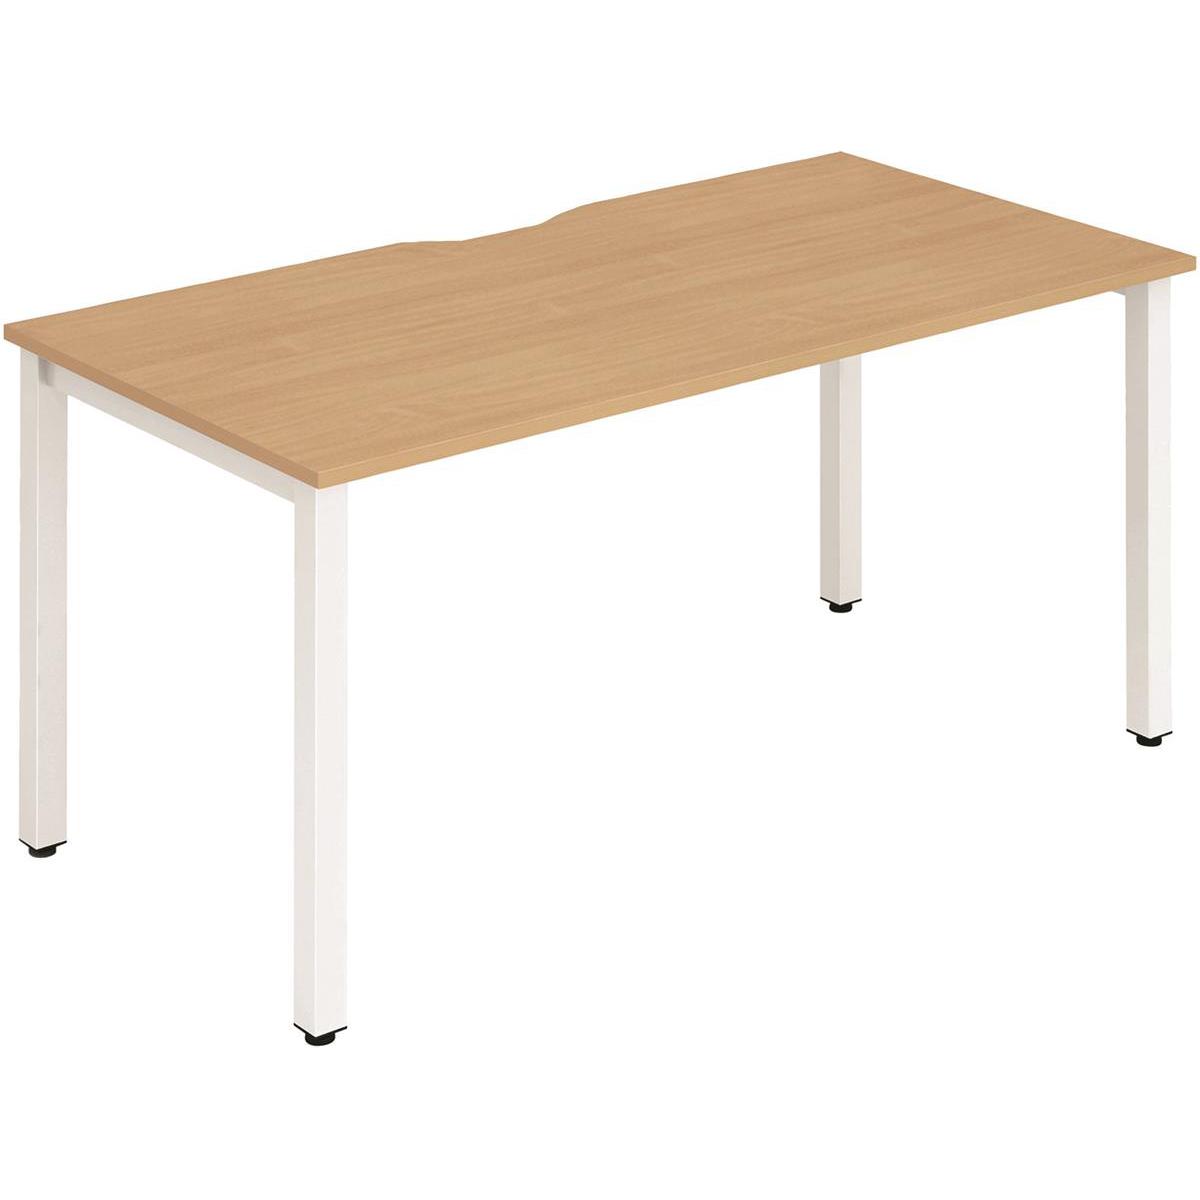 Trexus Bench Desk Individual White Leg 1400x800mm Beech Ref BE117